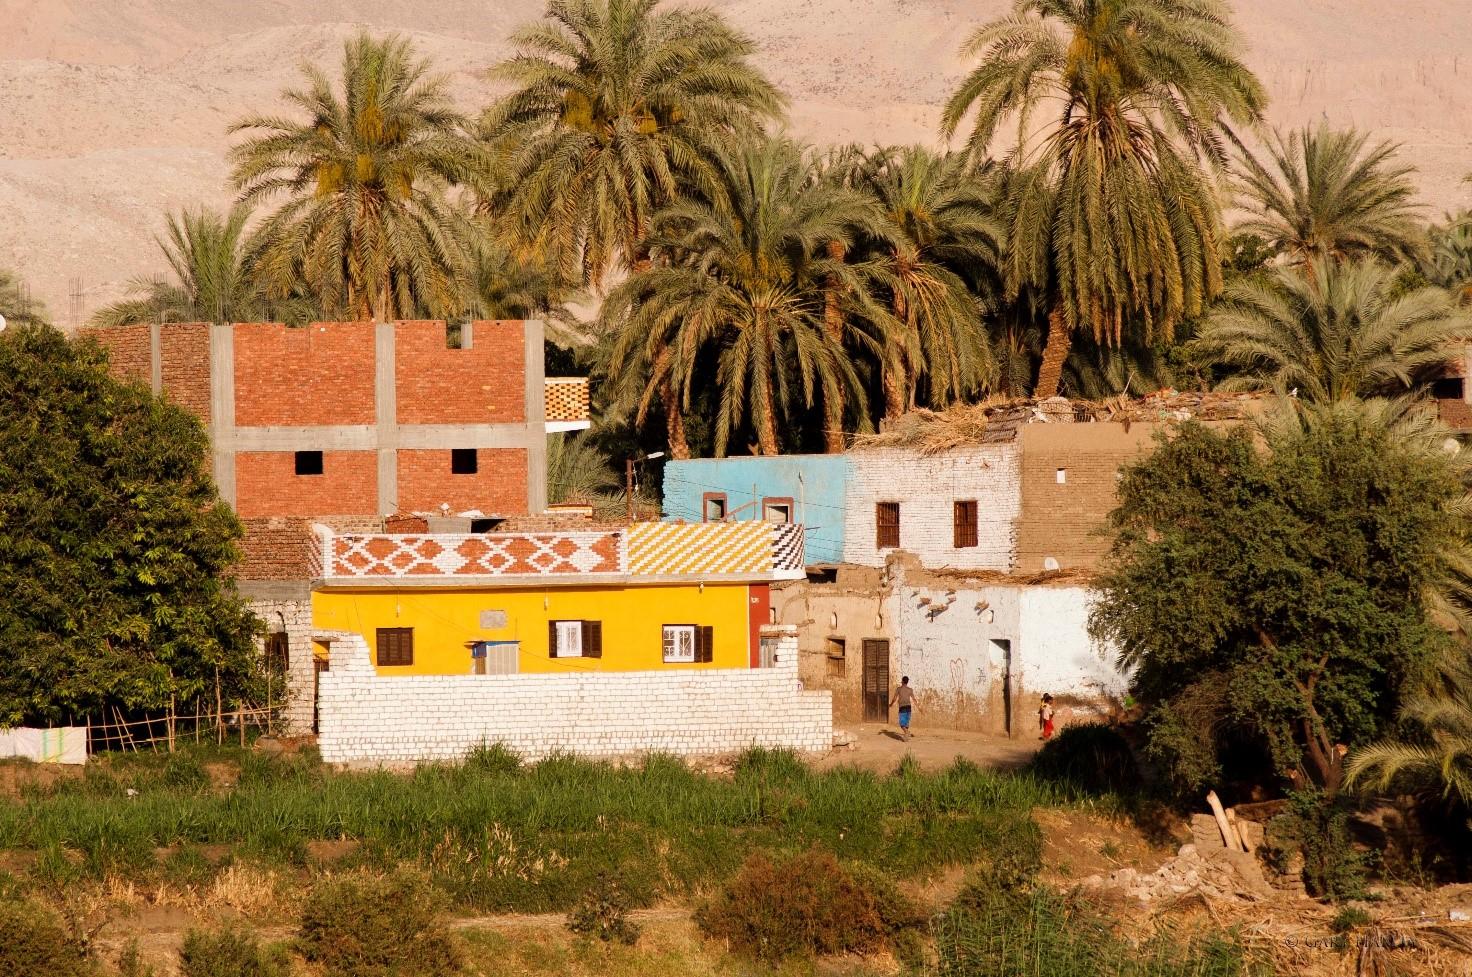 Nile2.jpg